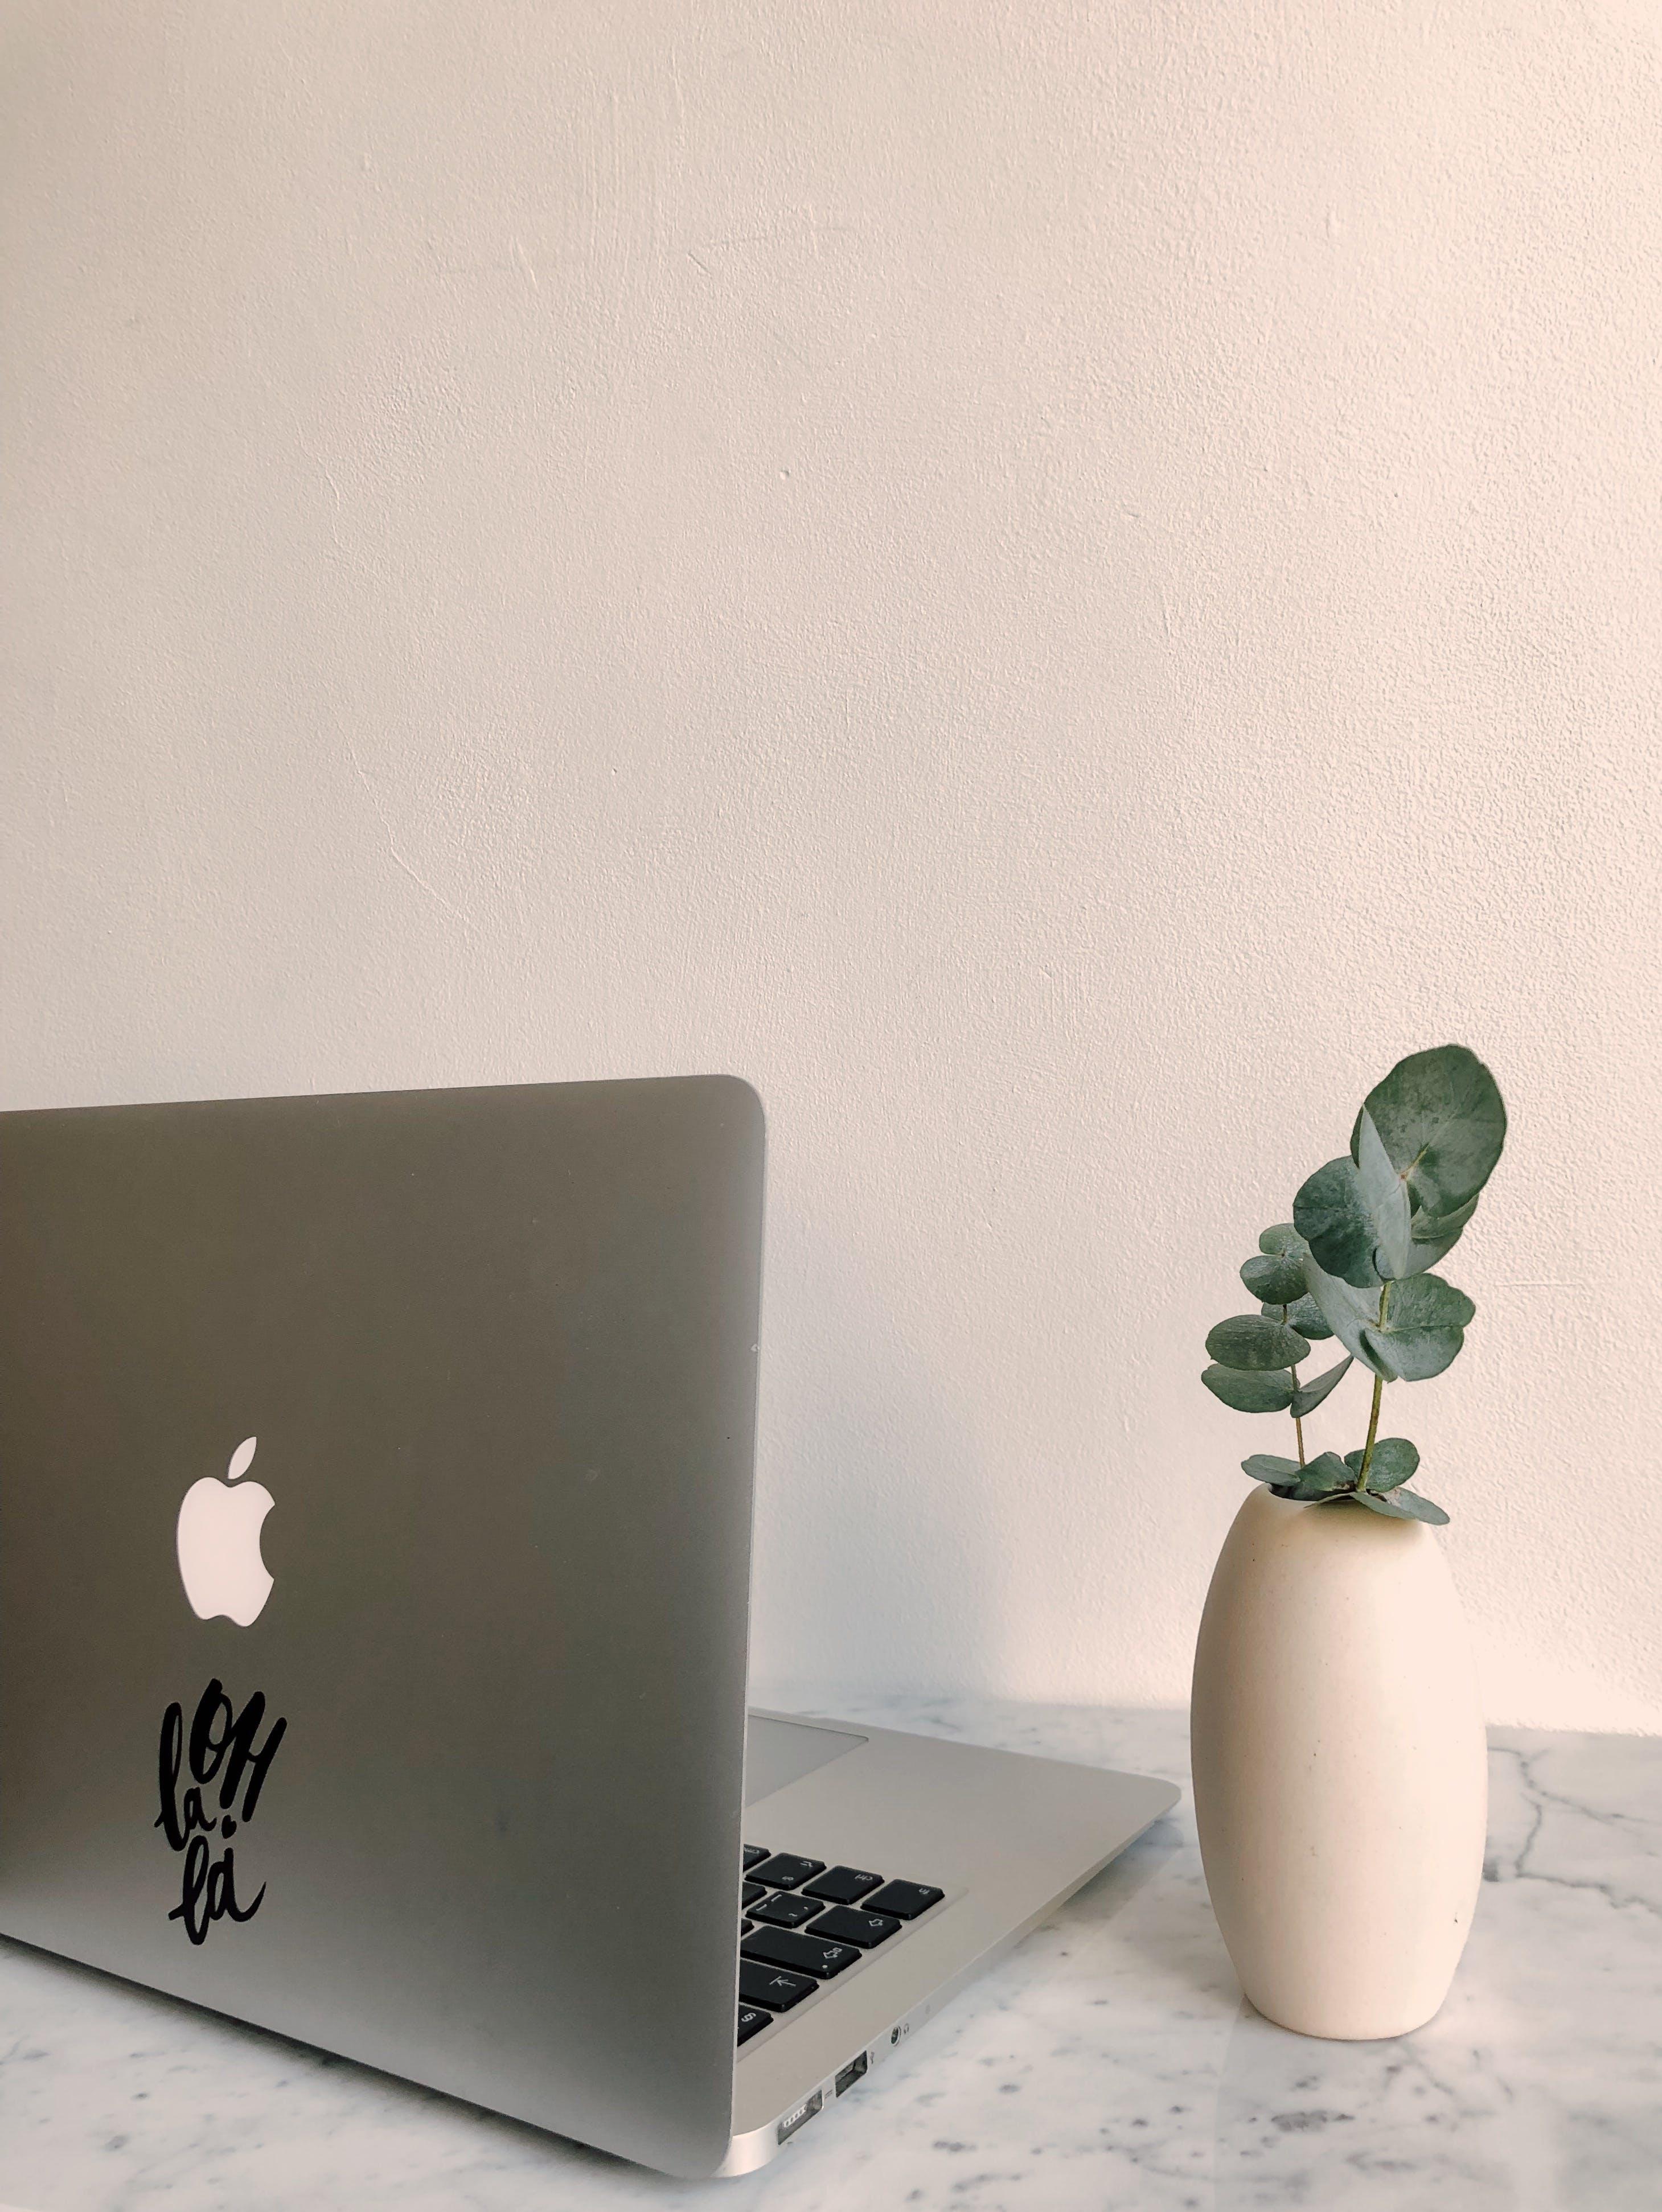 Photo of Macbook on Granite Desk